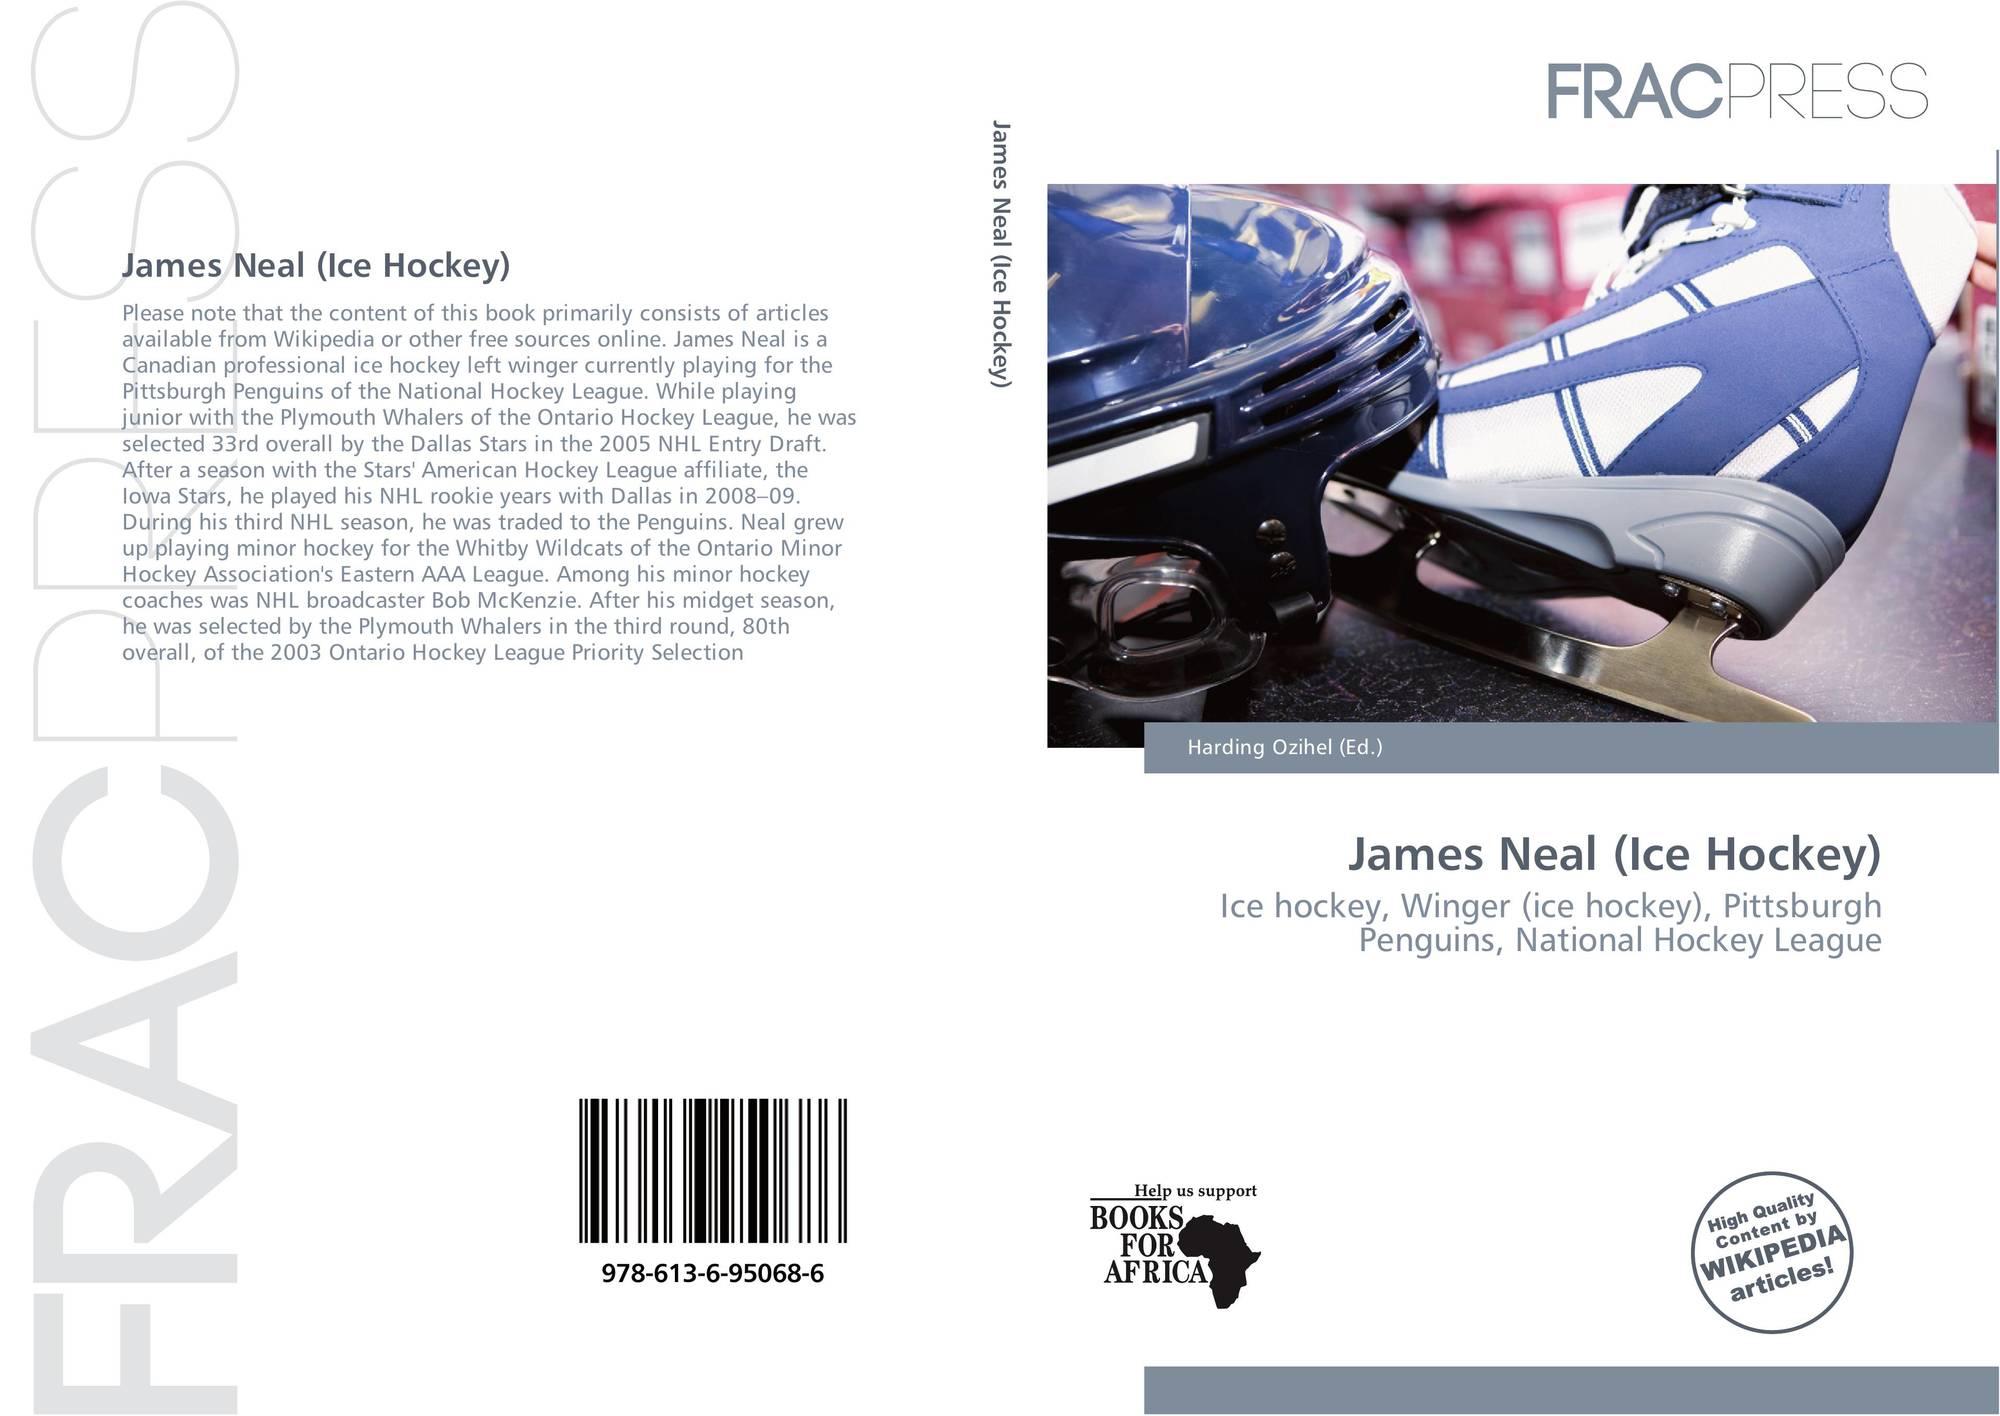 Bookcover of James Neal (Ice Hockey). 9786136950686 ba2b5bad9